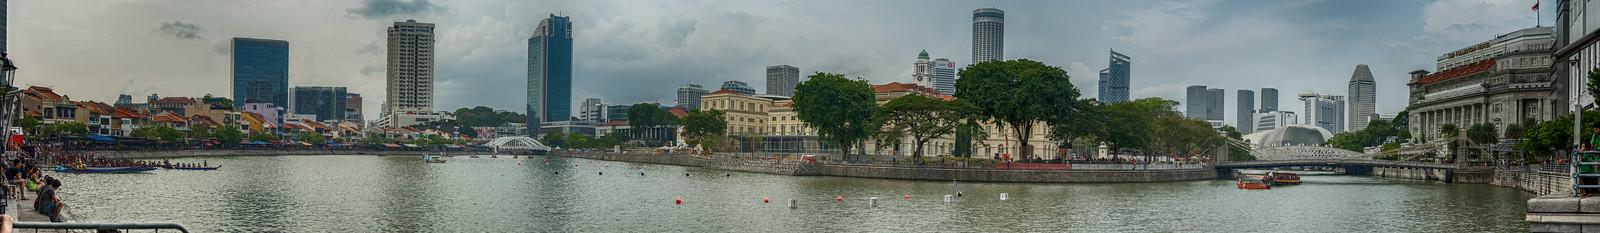 Панорама Singapore River